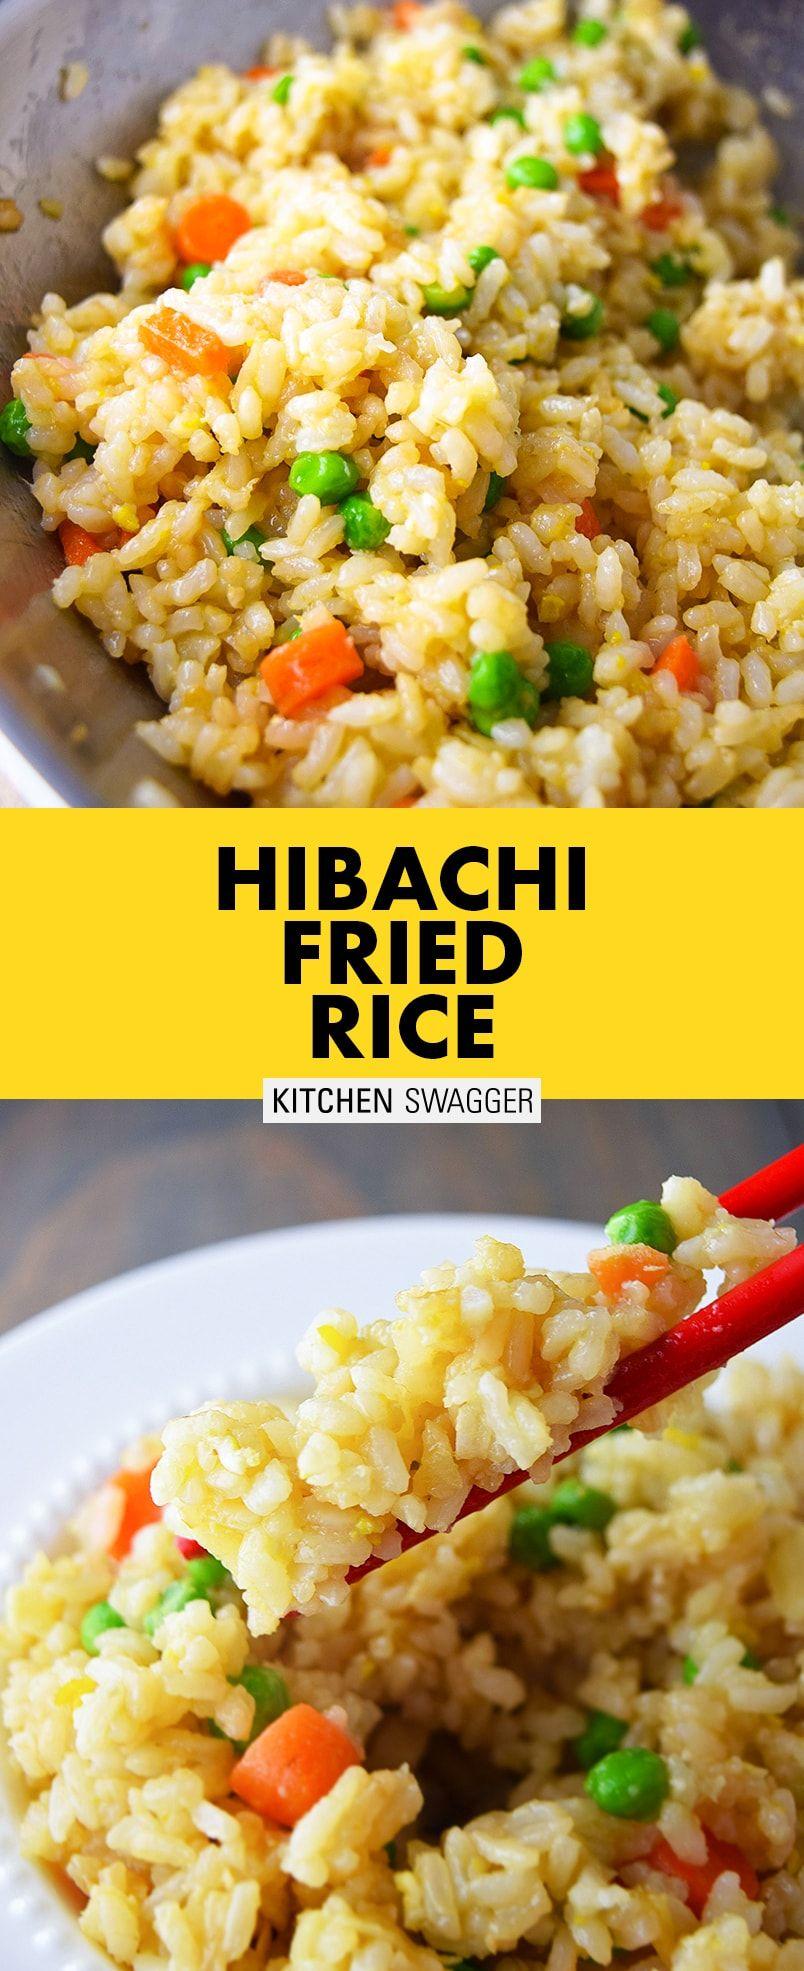 Hibachi-Style Fried Rice Recipe | Kitchen Swagger